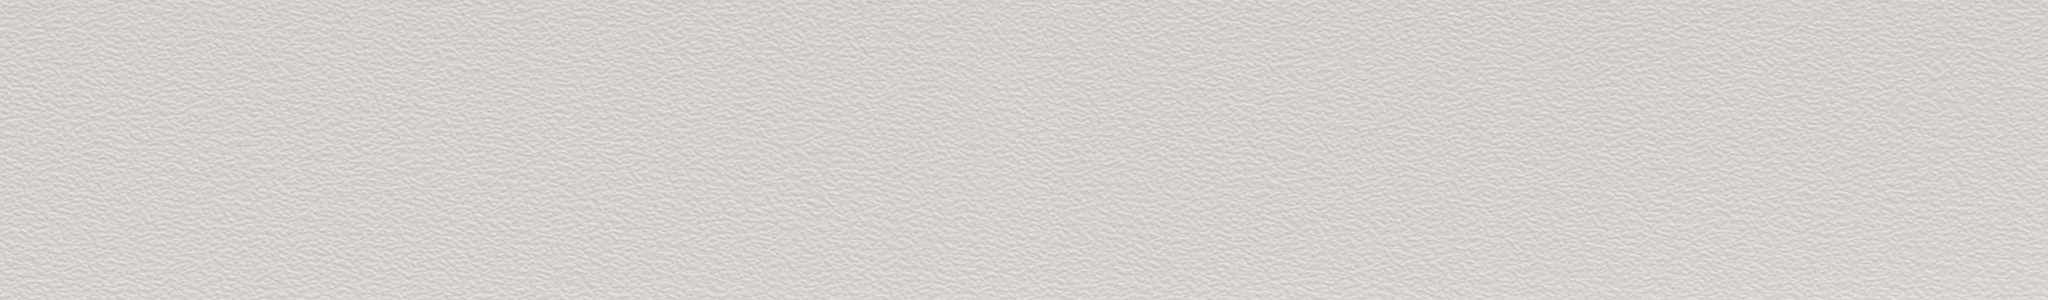 HU 172168 Кромка ABS Кашемир Серый - Шагрень XG